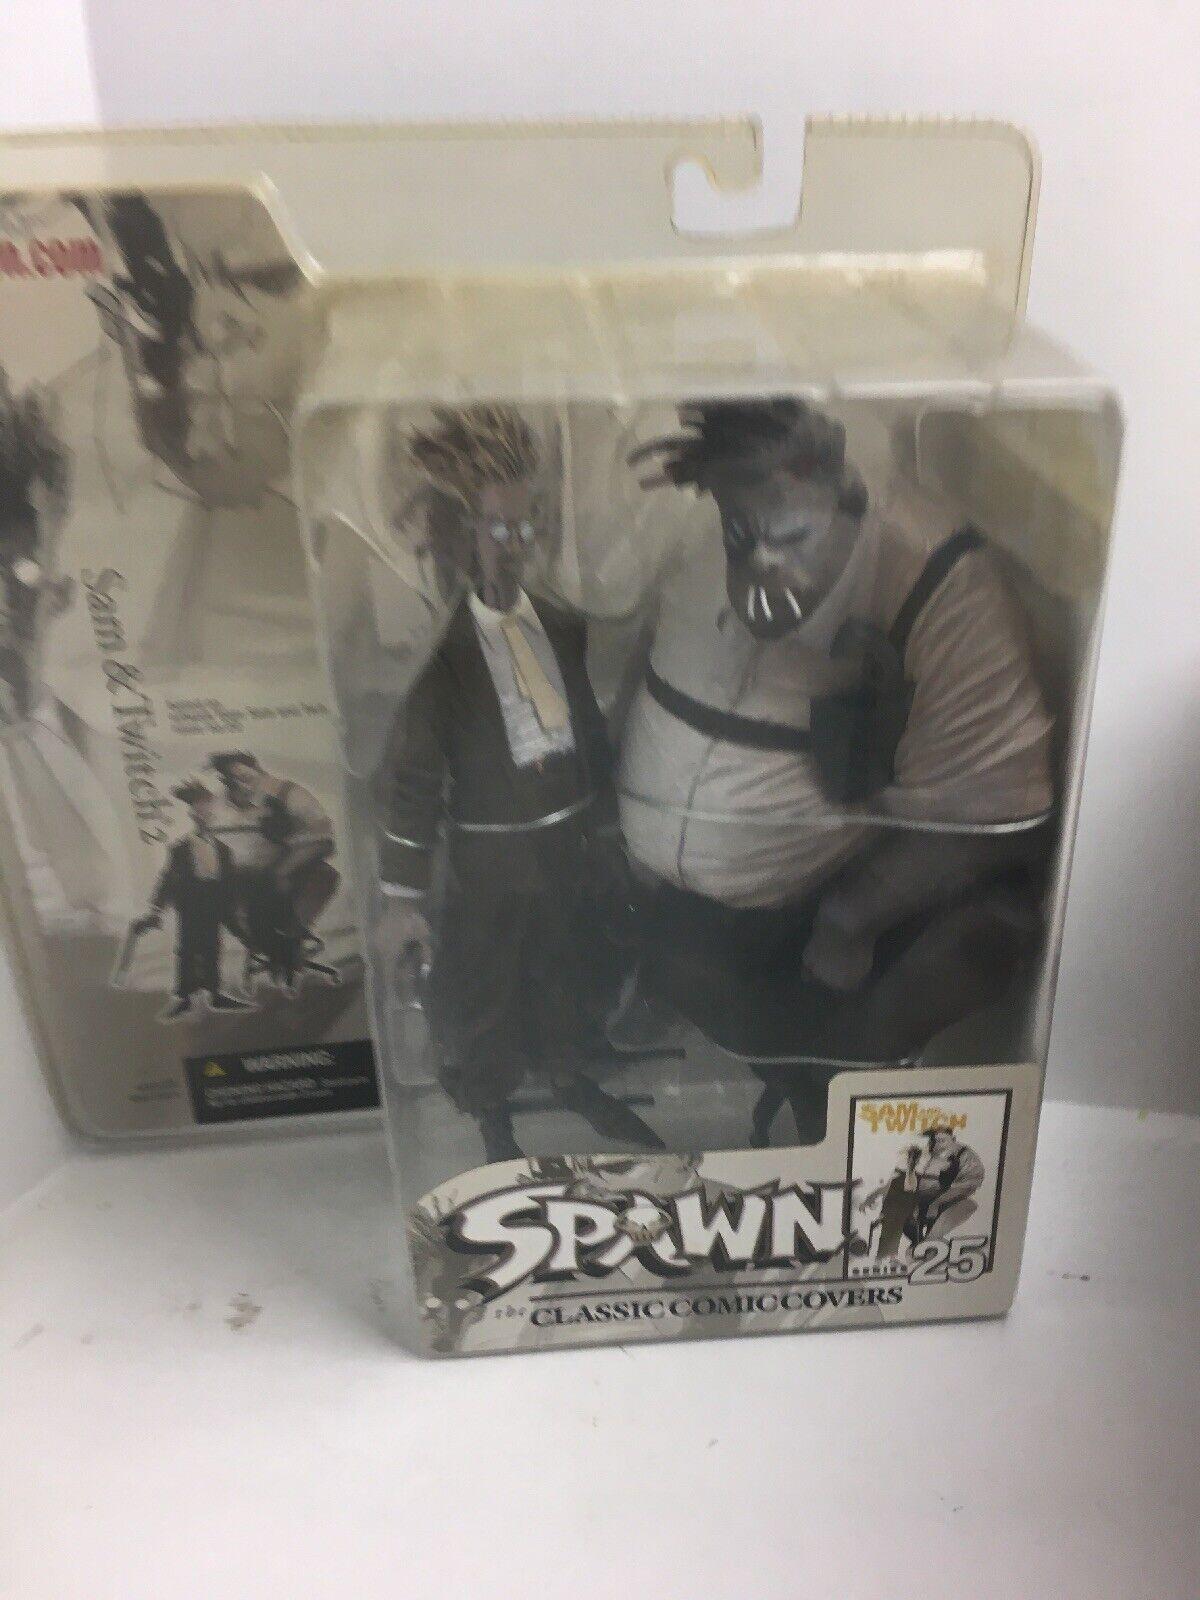 McFarlane giocattoli Sam e Twitch Spawn 25 azione cifra with 3 Cigarettes Variant